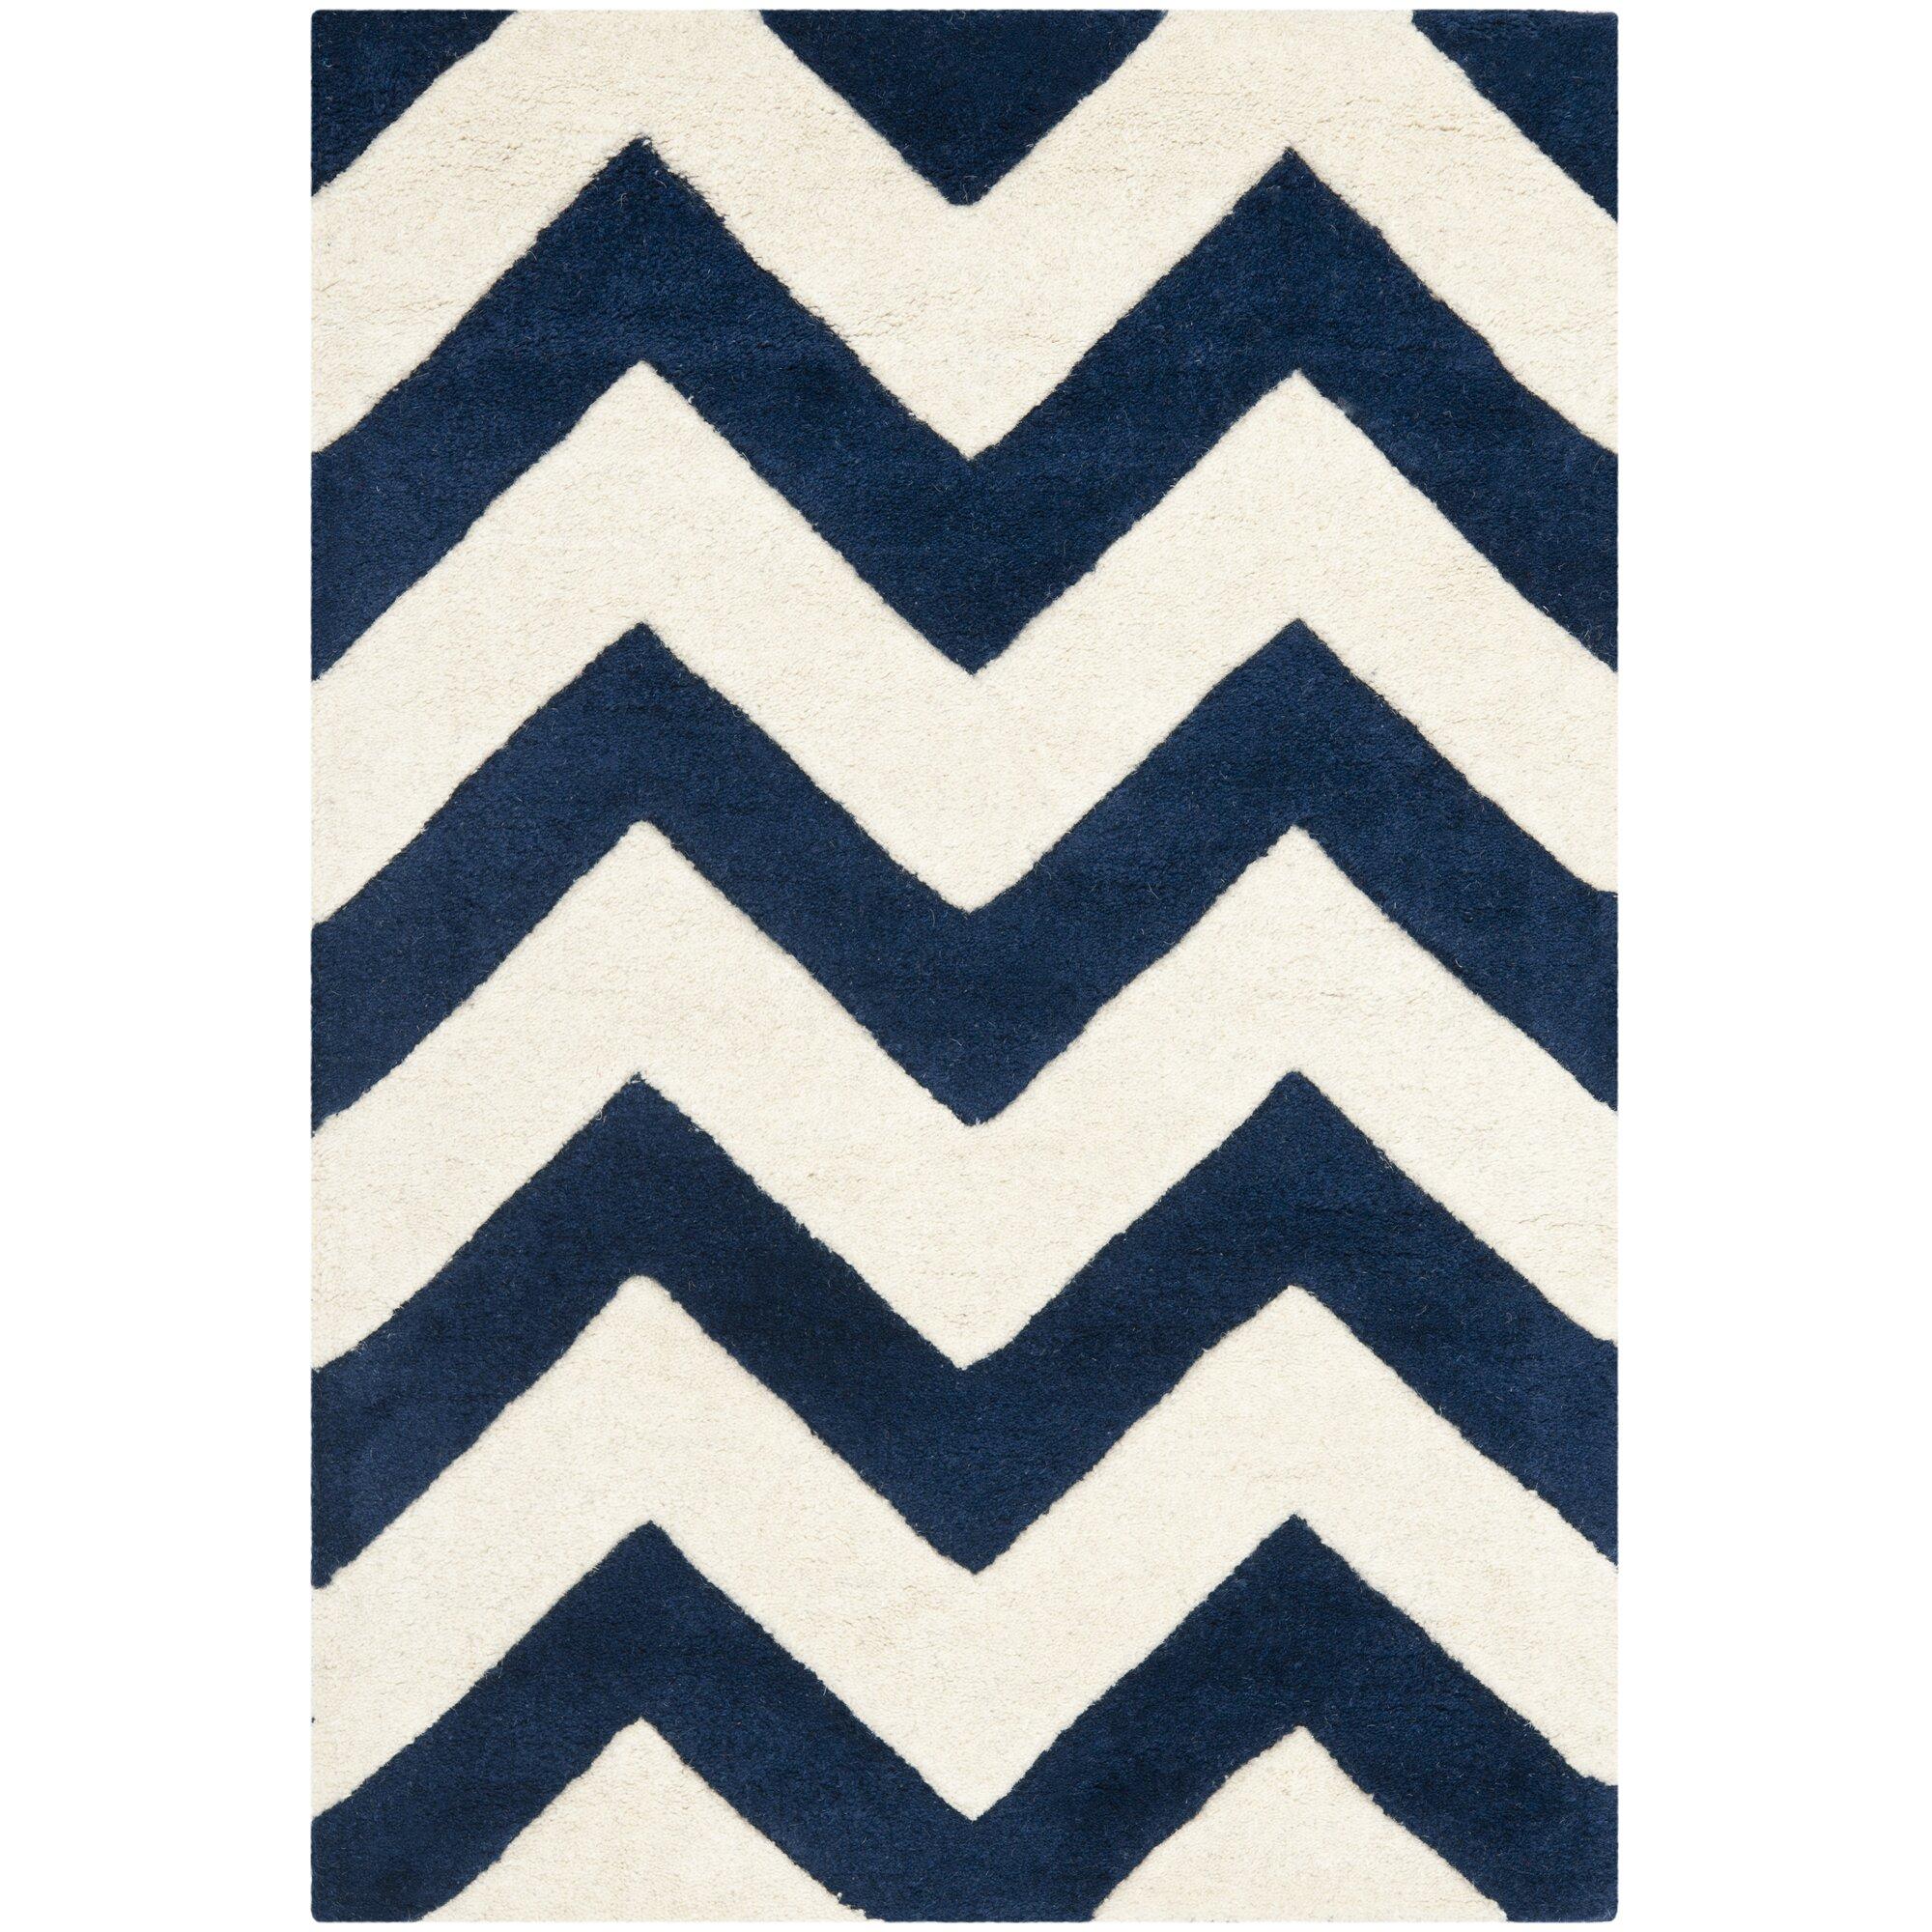 chevron area rug - varick gallery wilkin dark blue ivory chevron area rug reviews